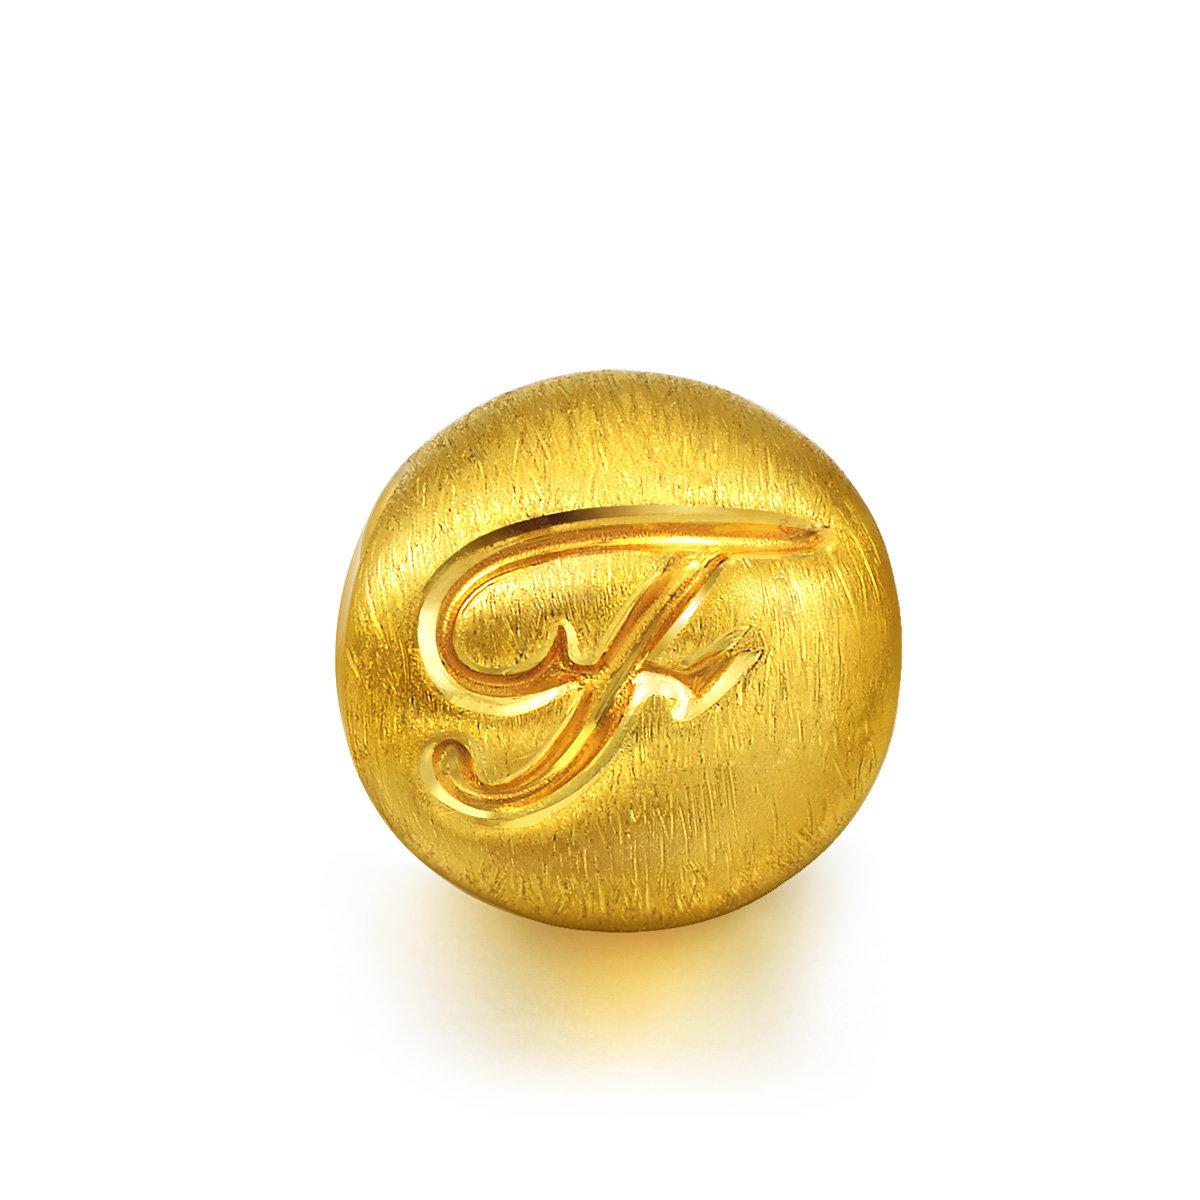 Charme 'Alphabets' 999 Gold Letter F Charm (Bracelet not included)